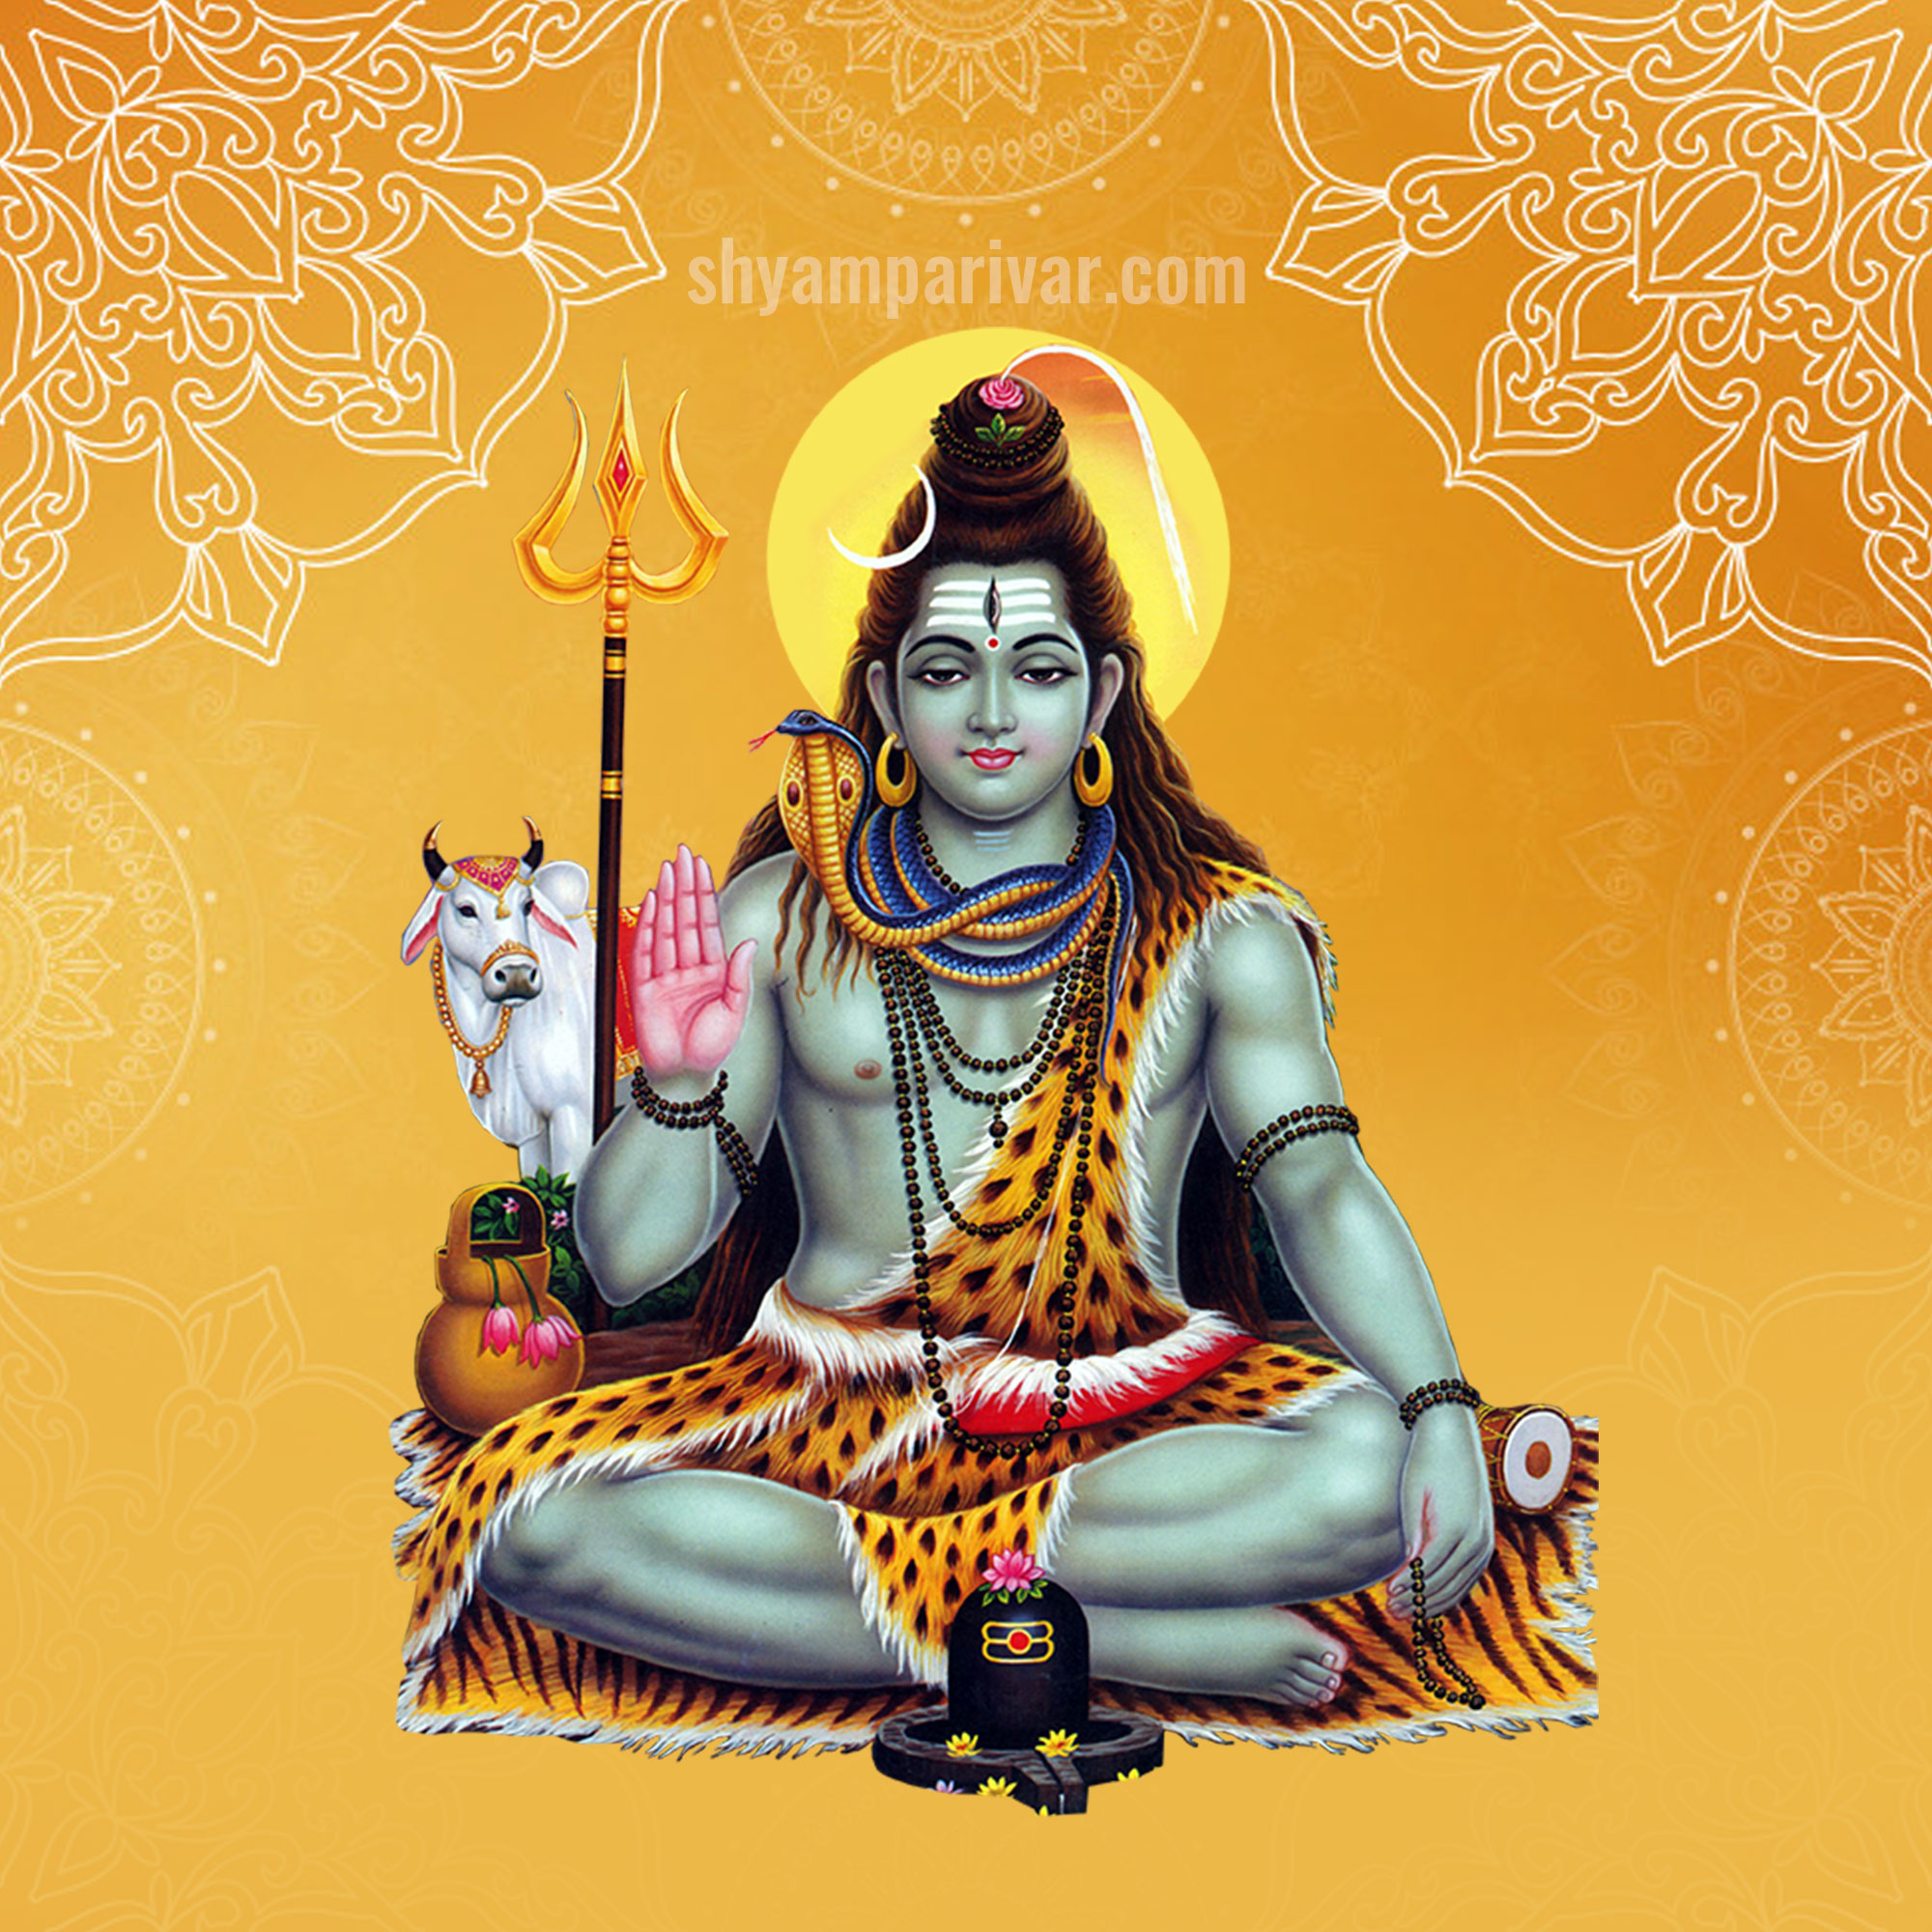 God Shiva HD wallpaper and images